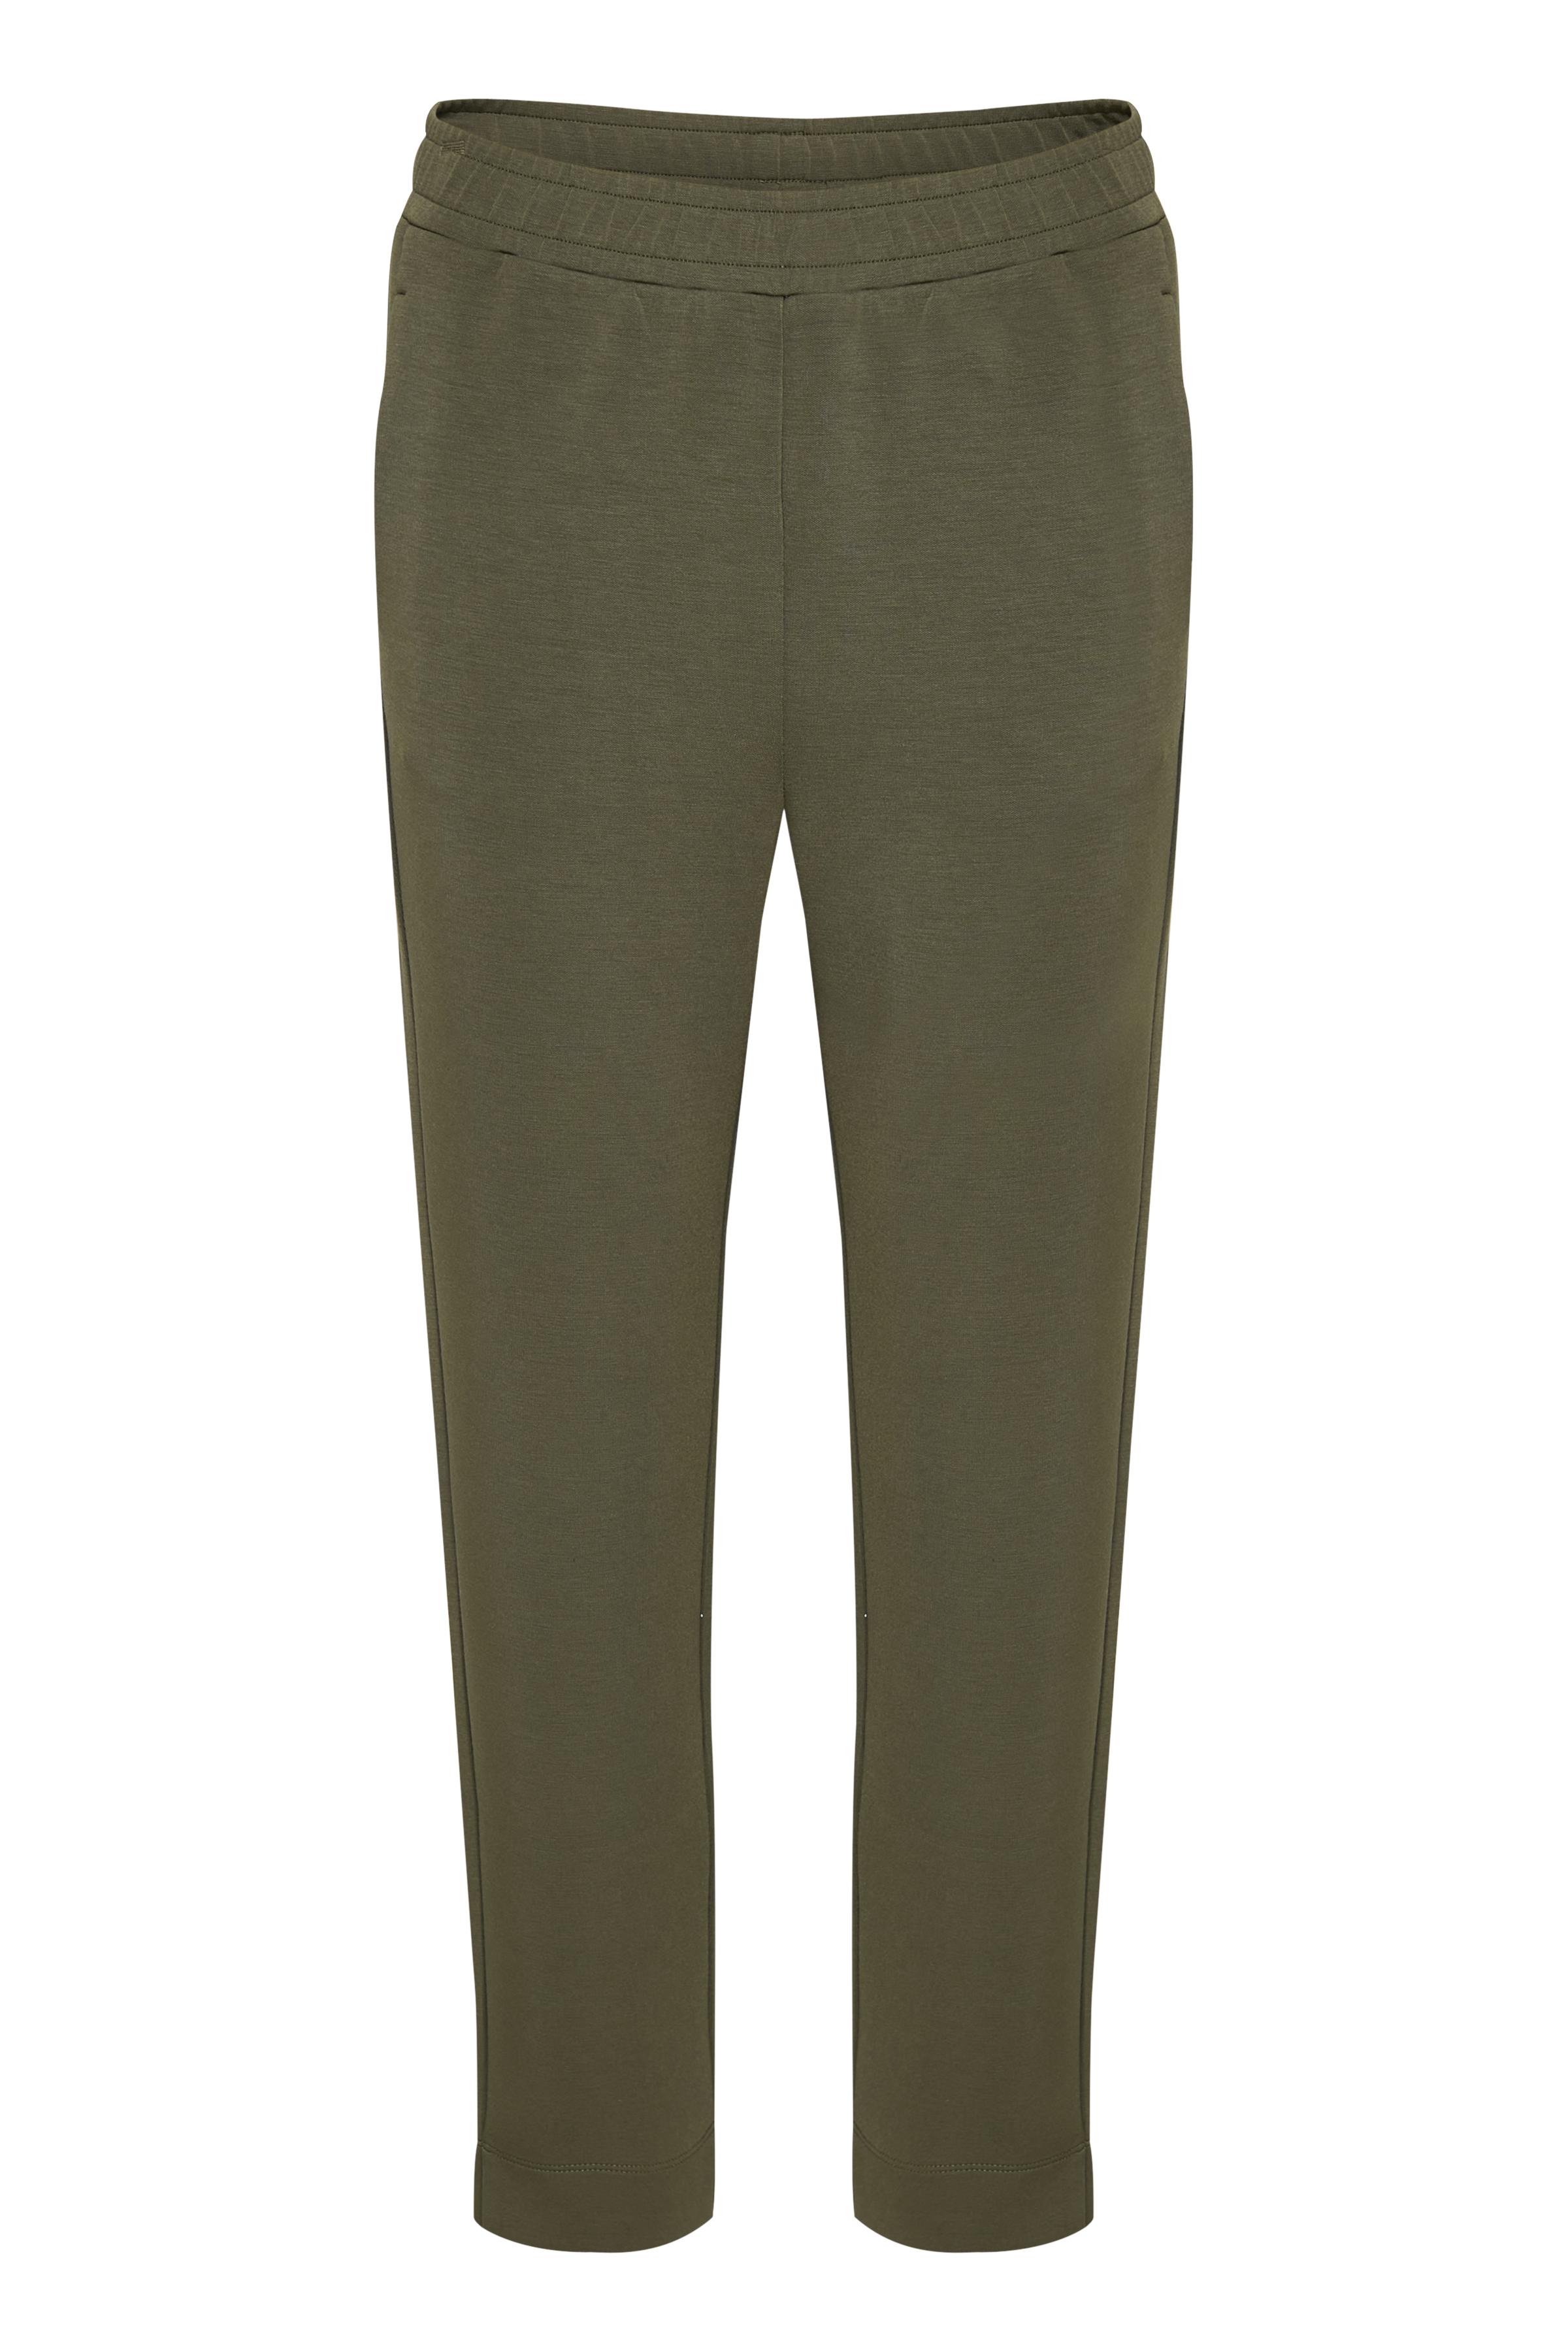 Inwear Daltoniw bukser